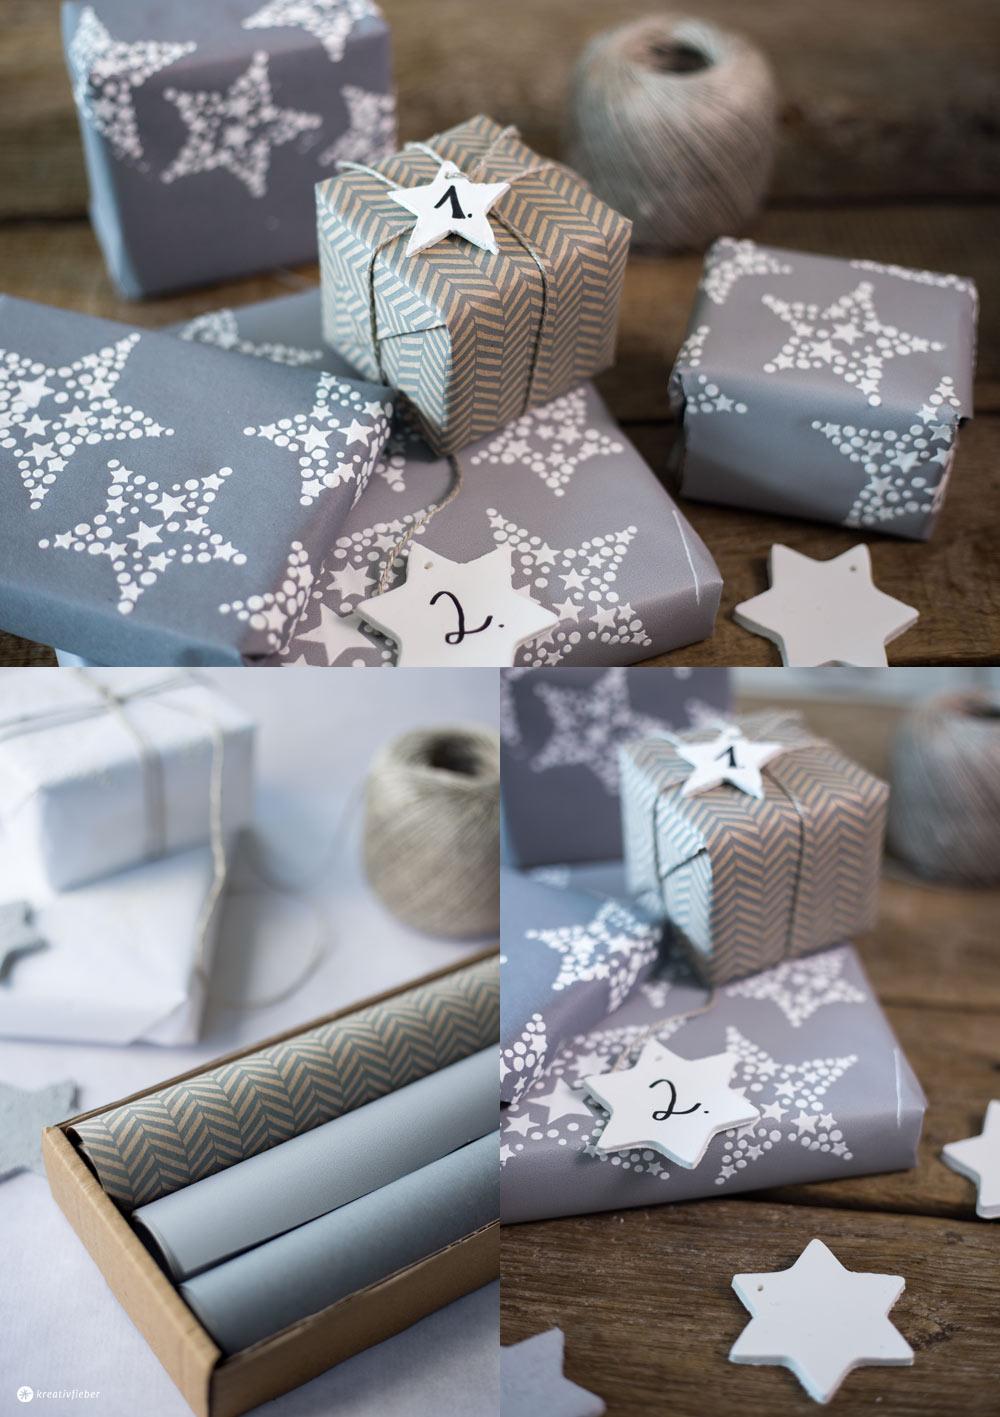 DIY Adventskalender Verpackung mit upcycling Geschenkpapier